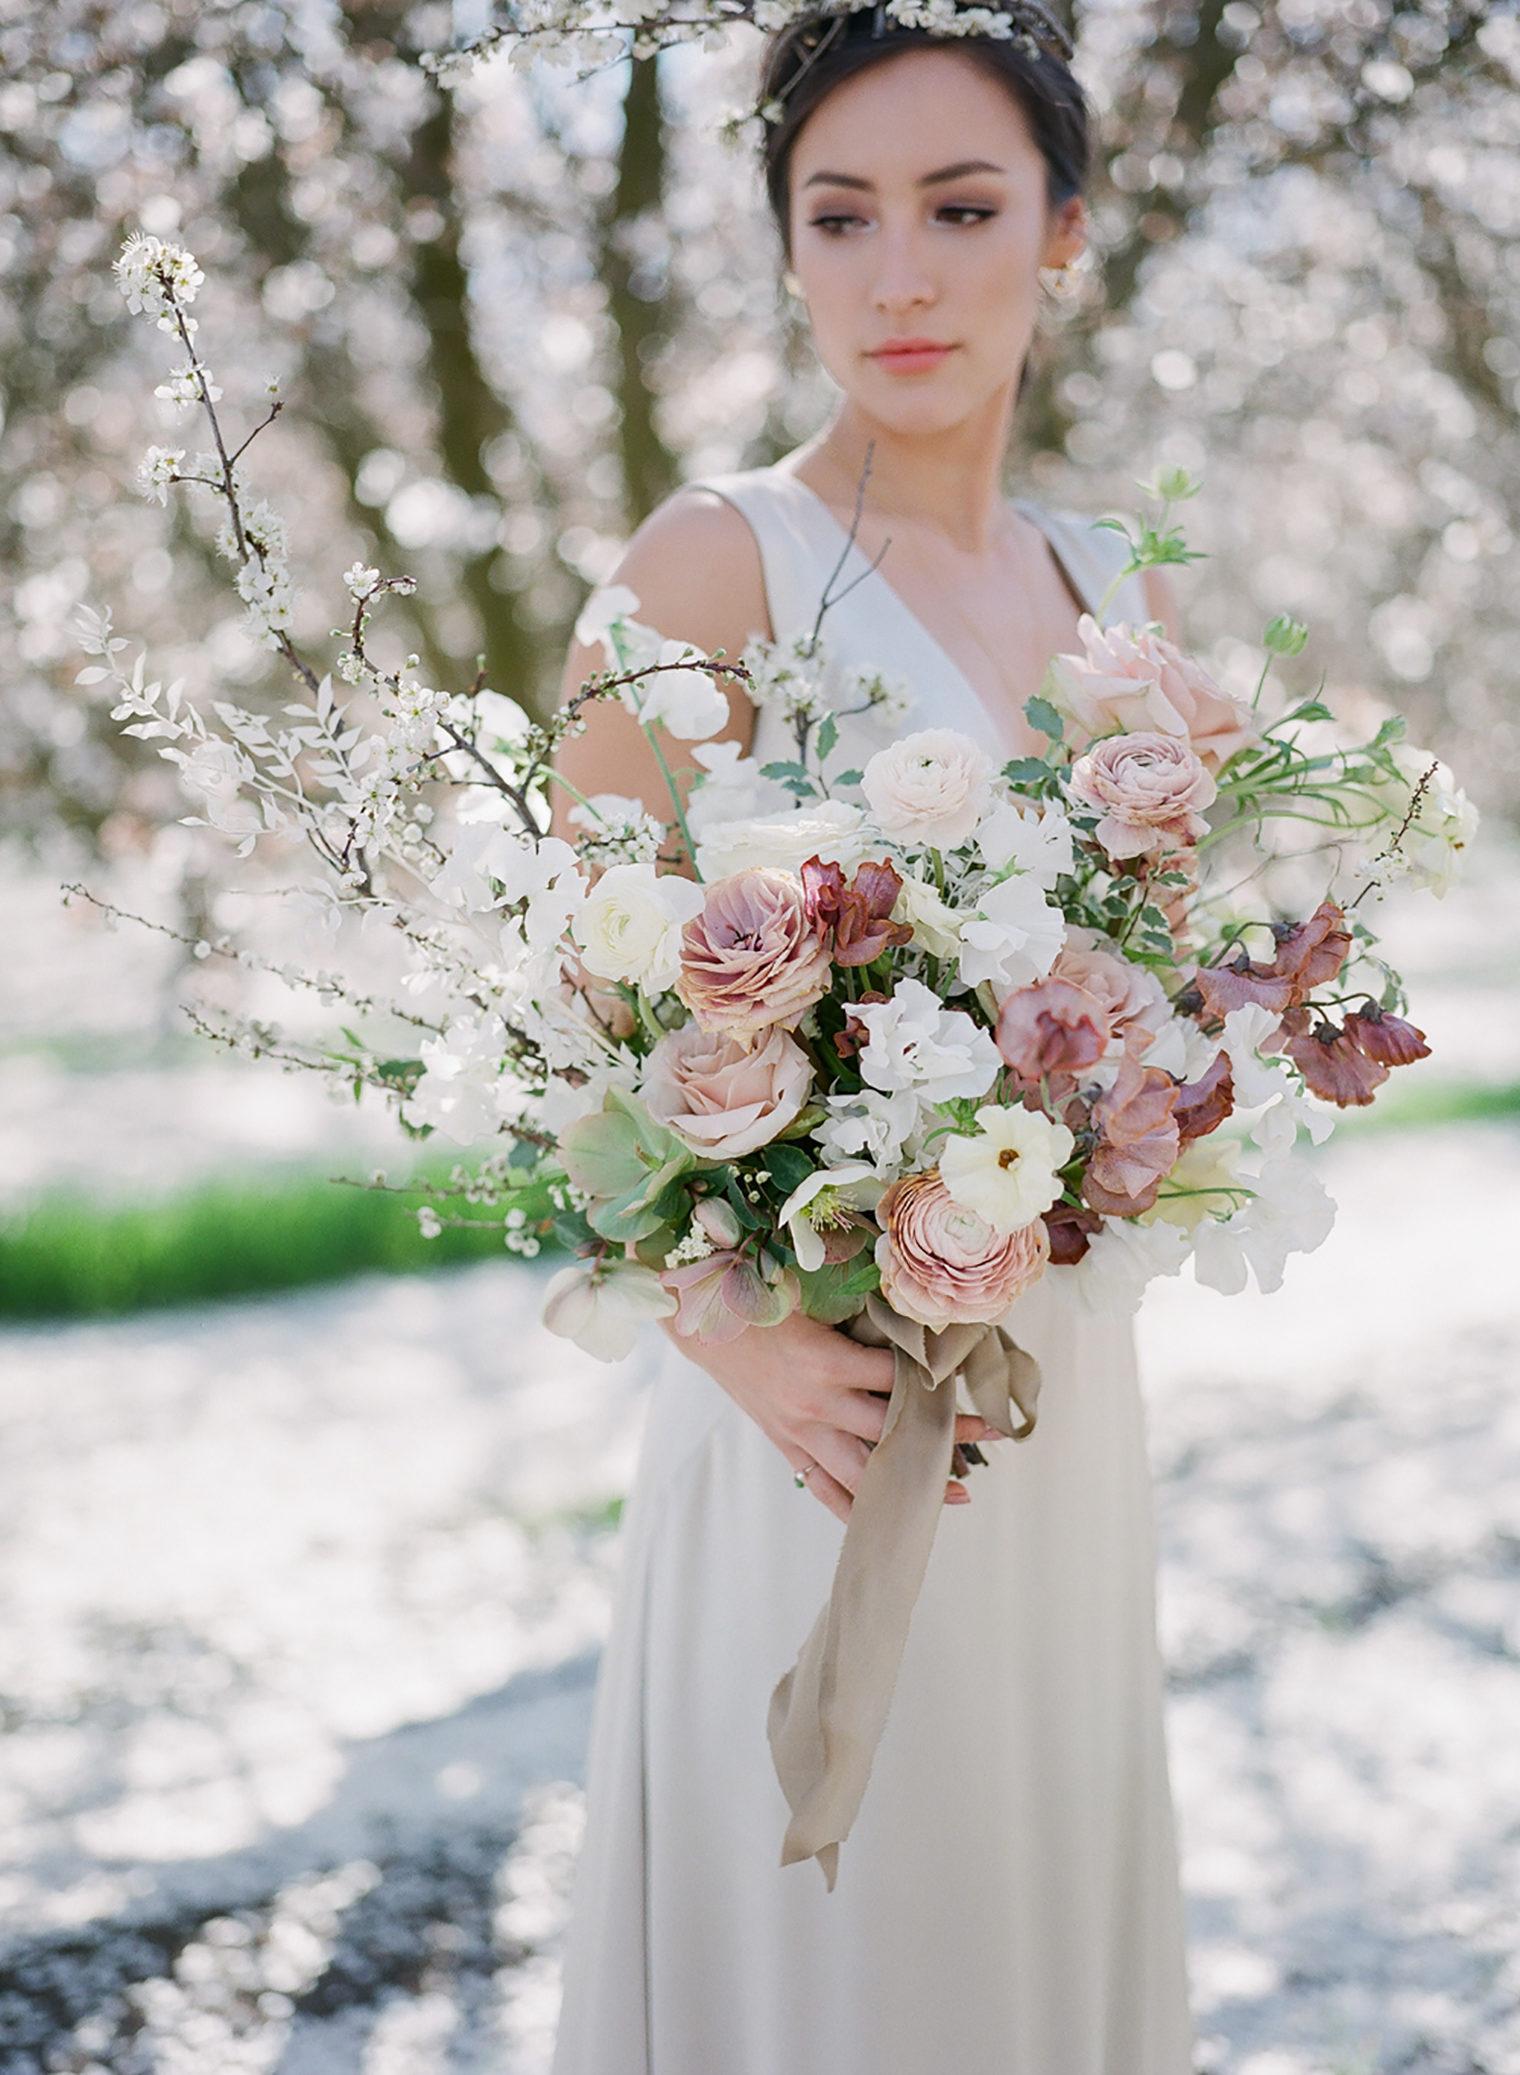 Bridal Bouquet wedding photographer Jeremy Chou florist Walnut & Main